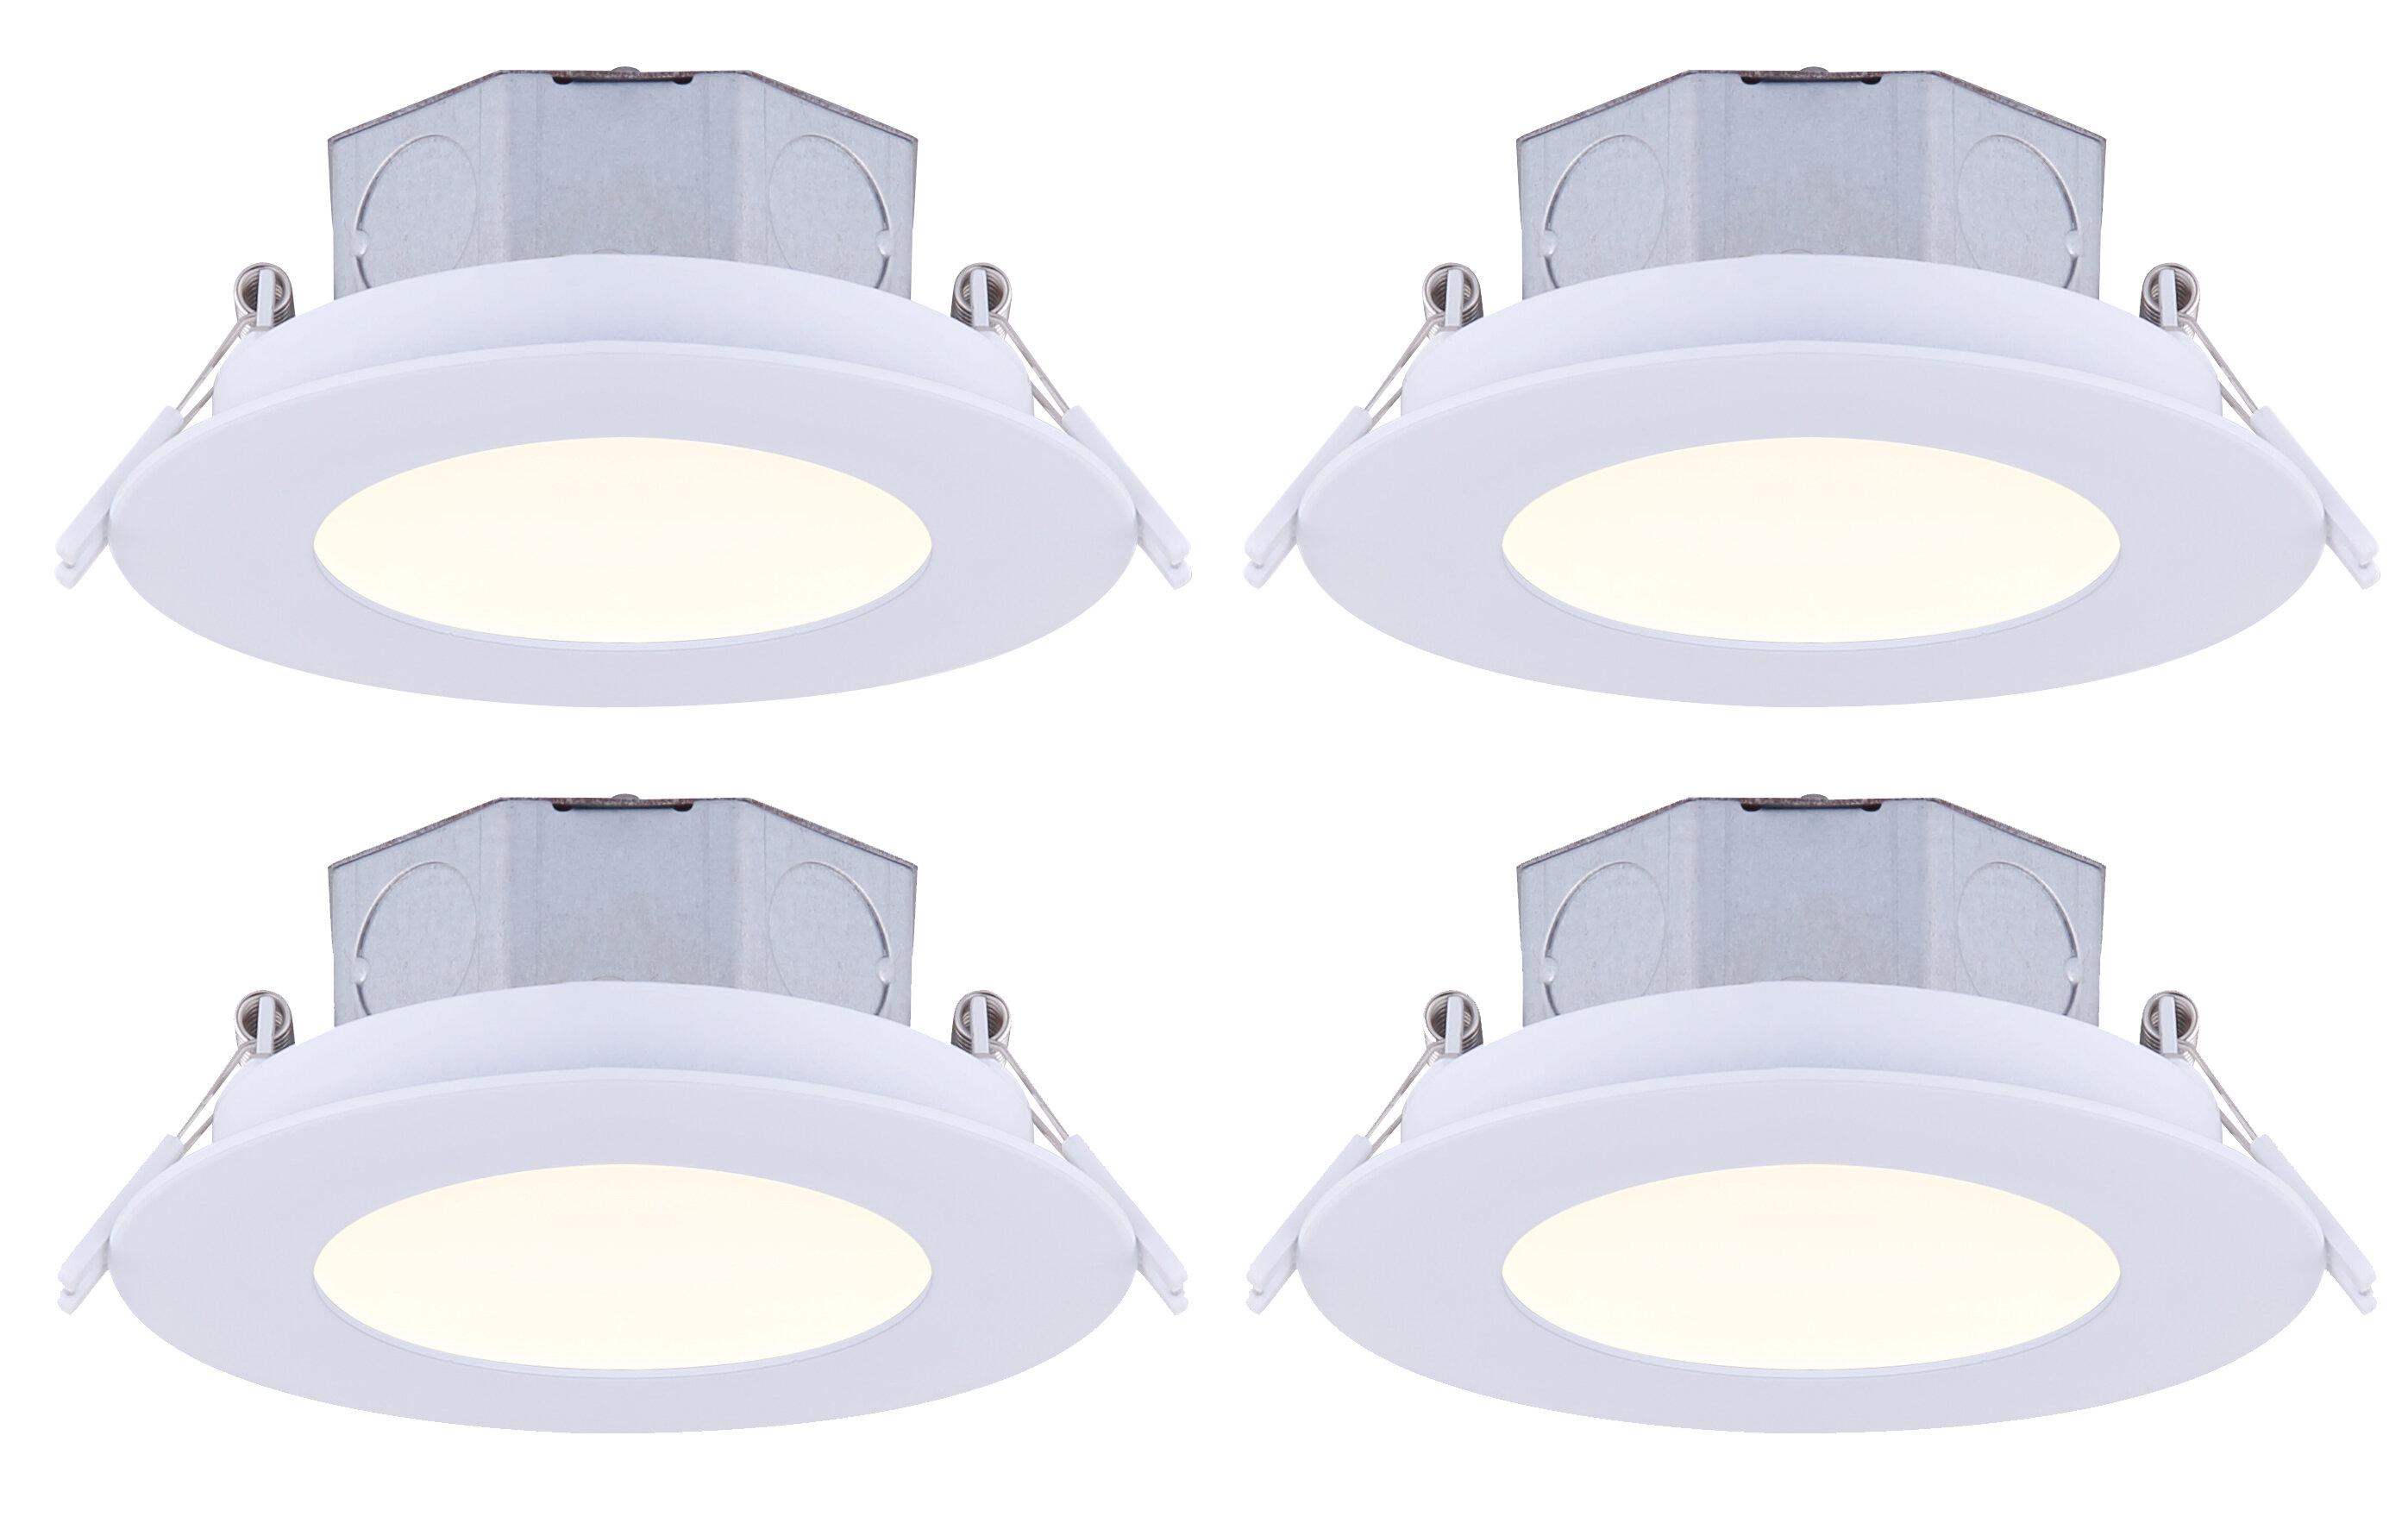 Canarm Retrofit Downlight Led Recessed Lighting Kit Wayfair